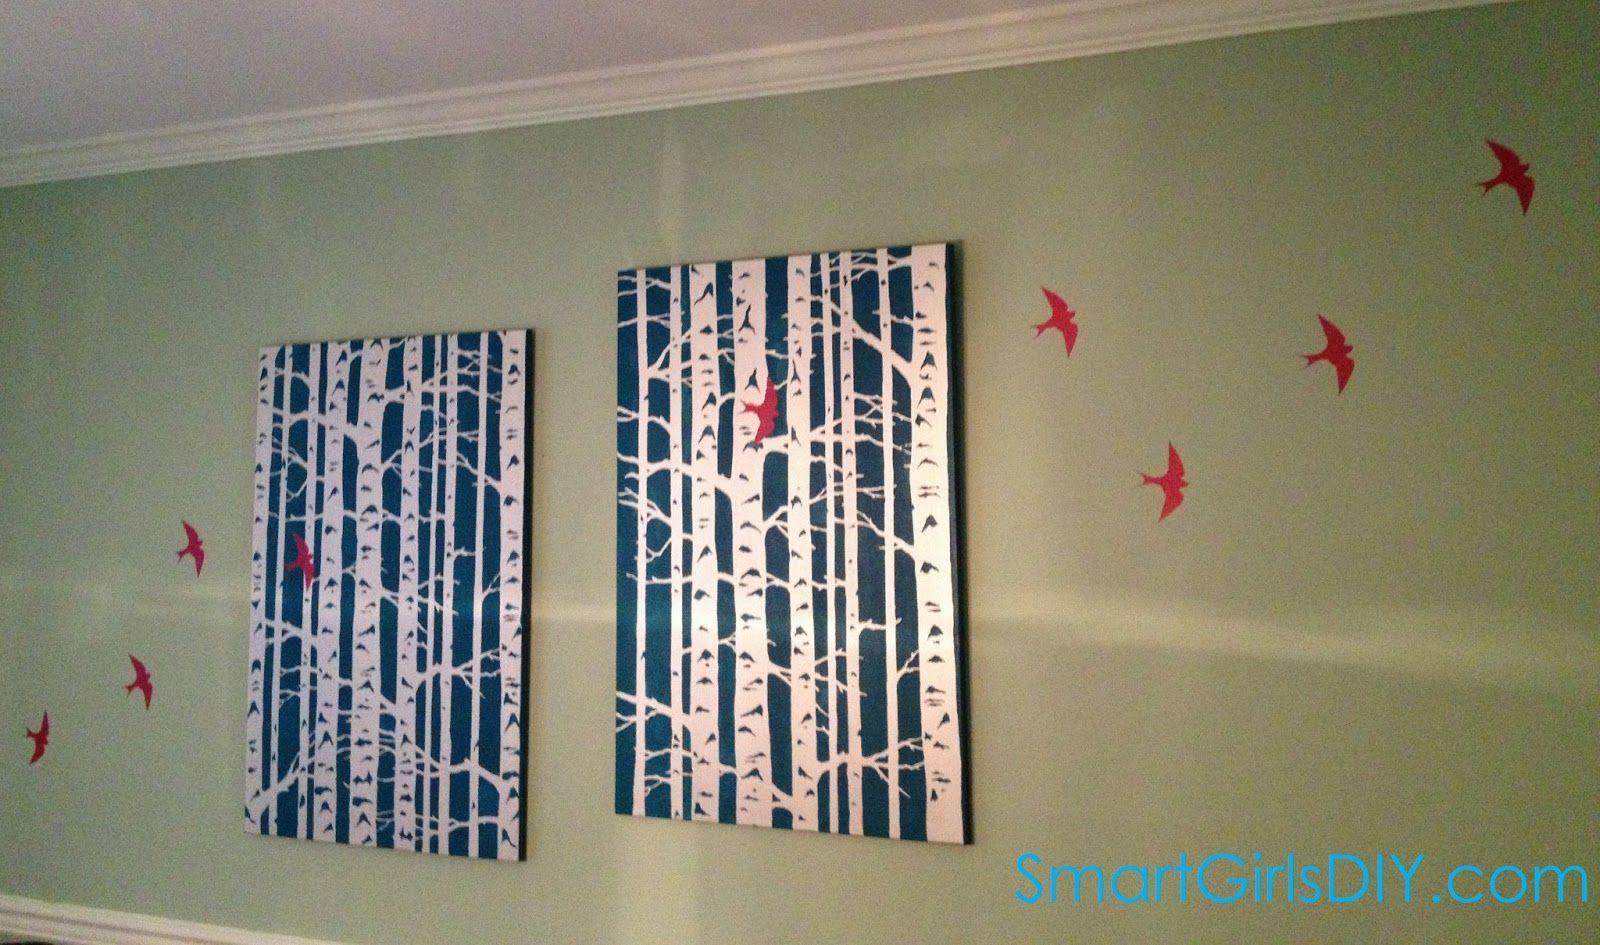 Birch Tree Wall Decal Aspen Trunk Wallpaper Vinyl Art Removable Plants b95